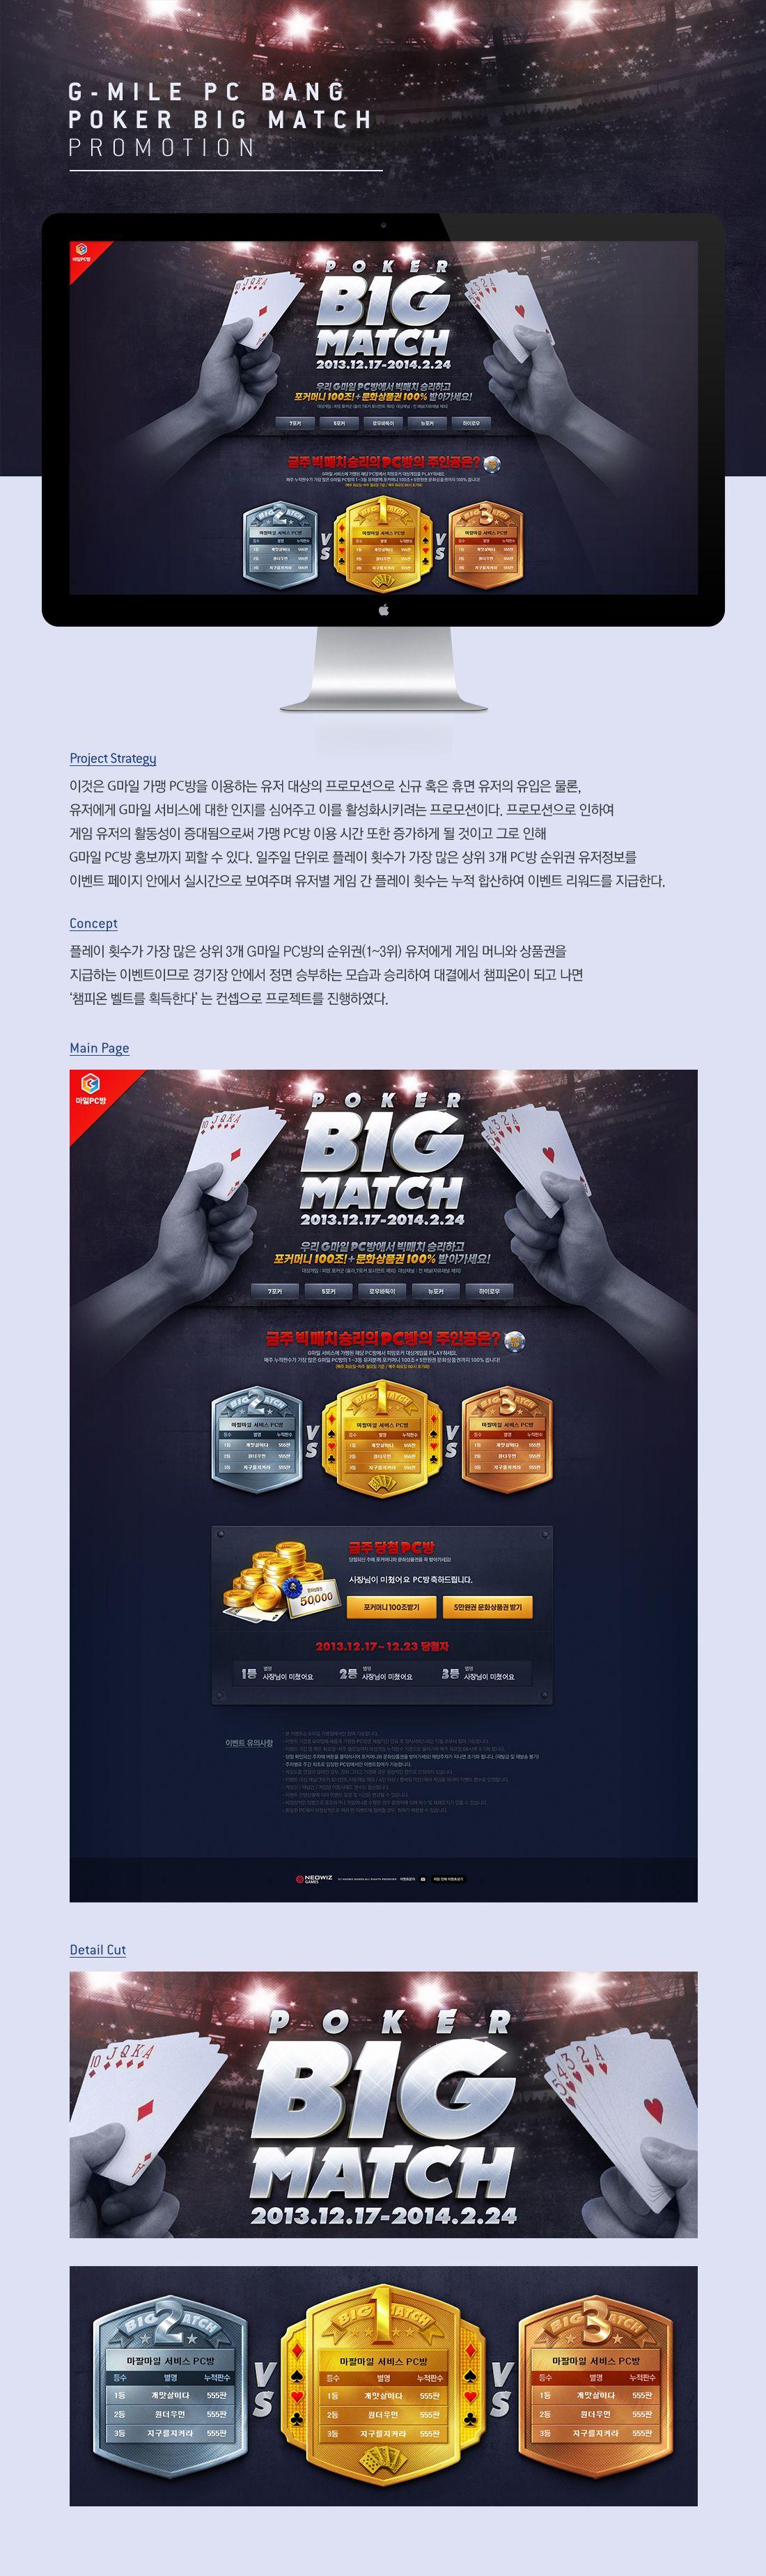 Poker BIG MATCH Pro...小频采集到棋牌(1450图)_花瓣 Event promotion